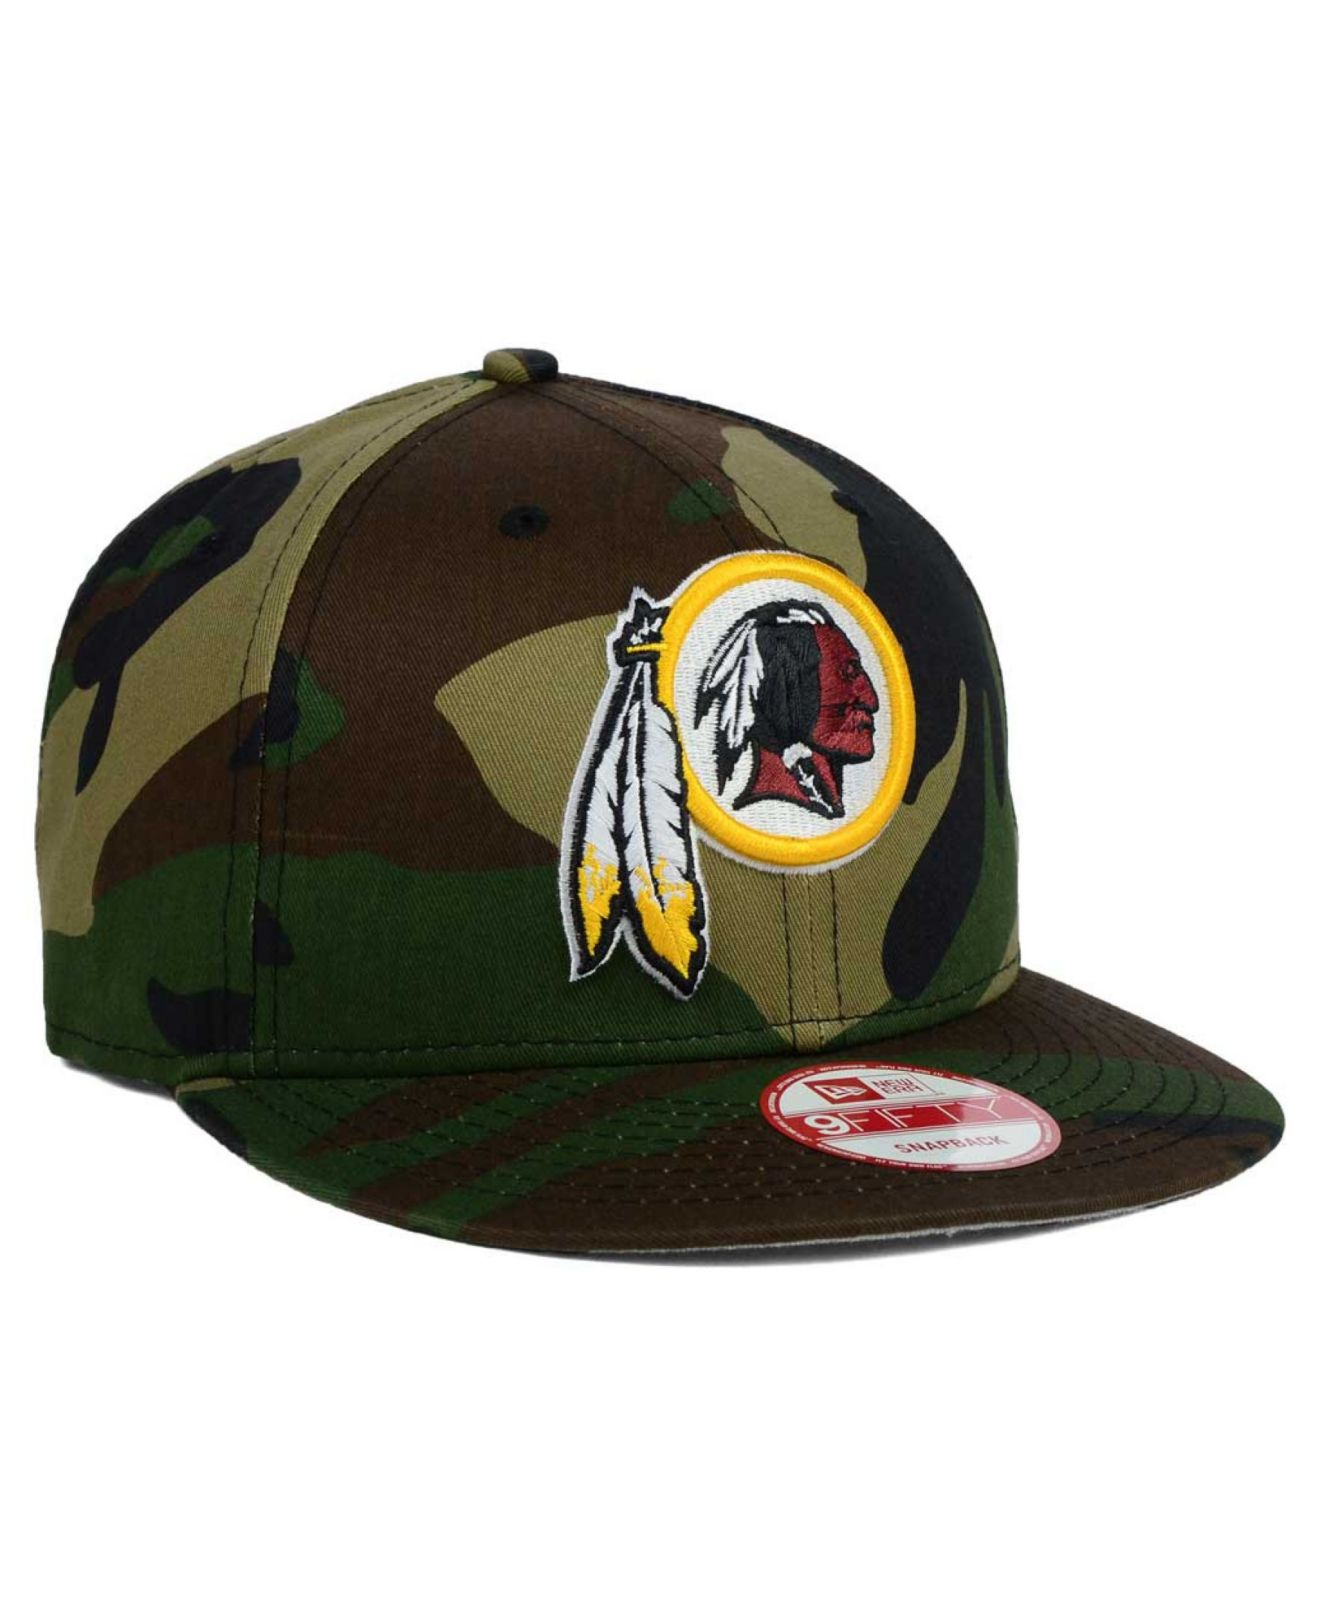 Lyst - KTZ Washington Redskins Woodland Camo Team Color 9fifty ... 0b73e3a73